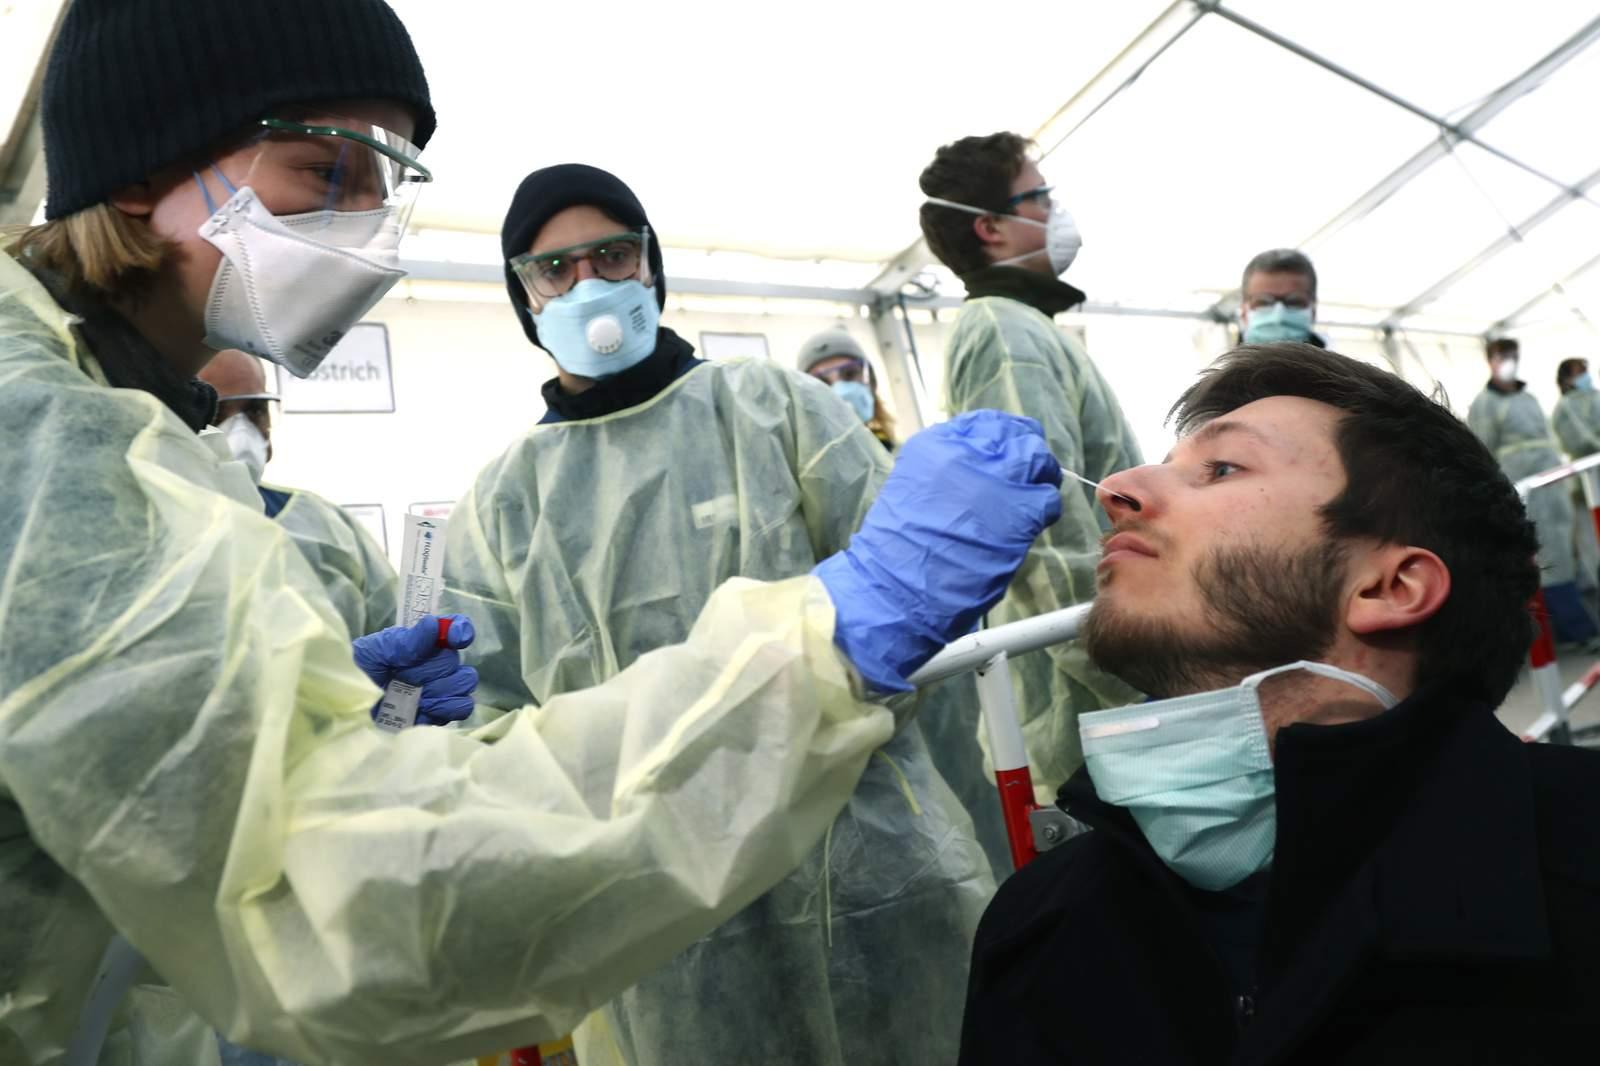 Alemania puntúa temprano contra virus 40